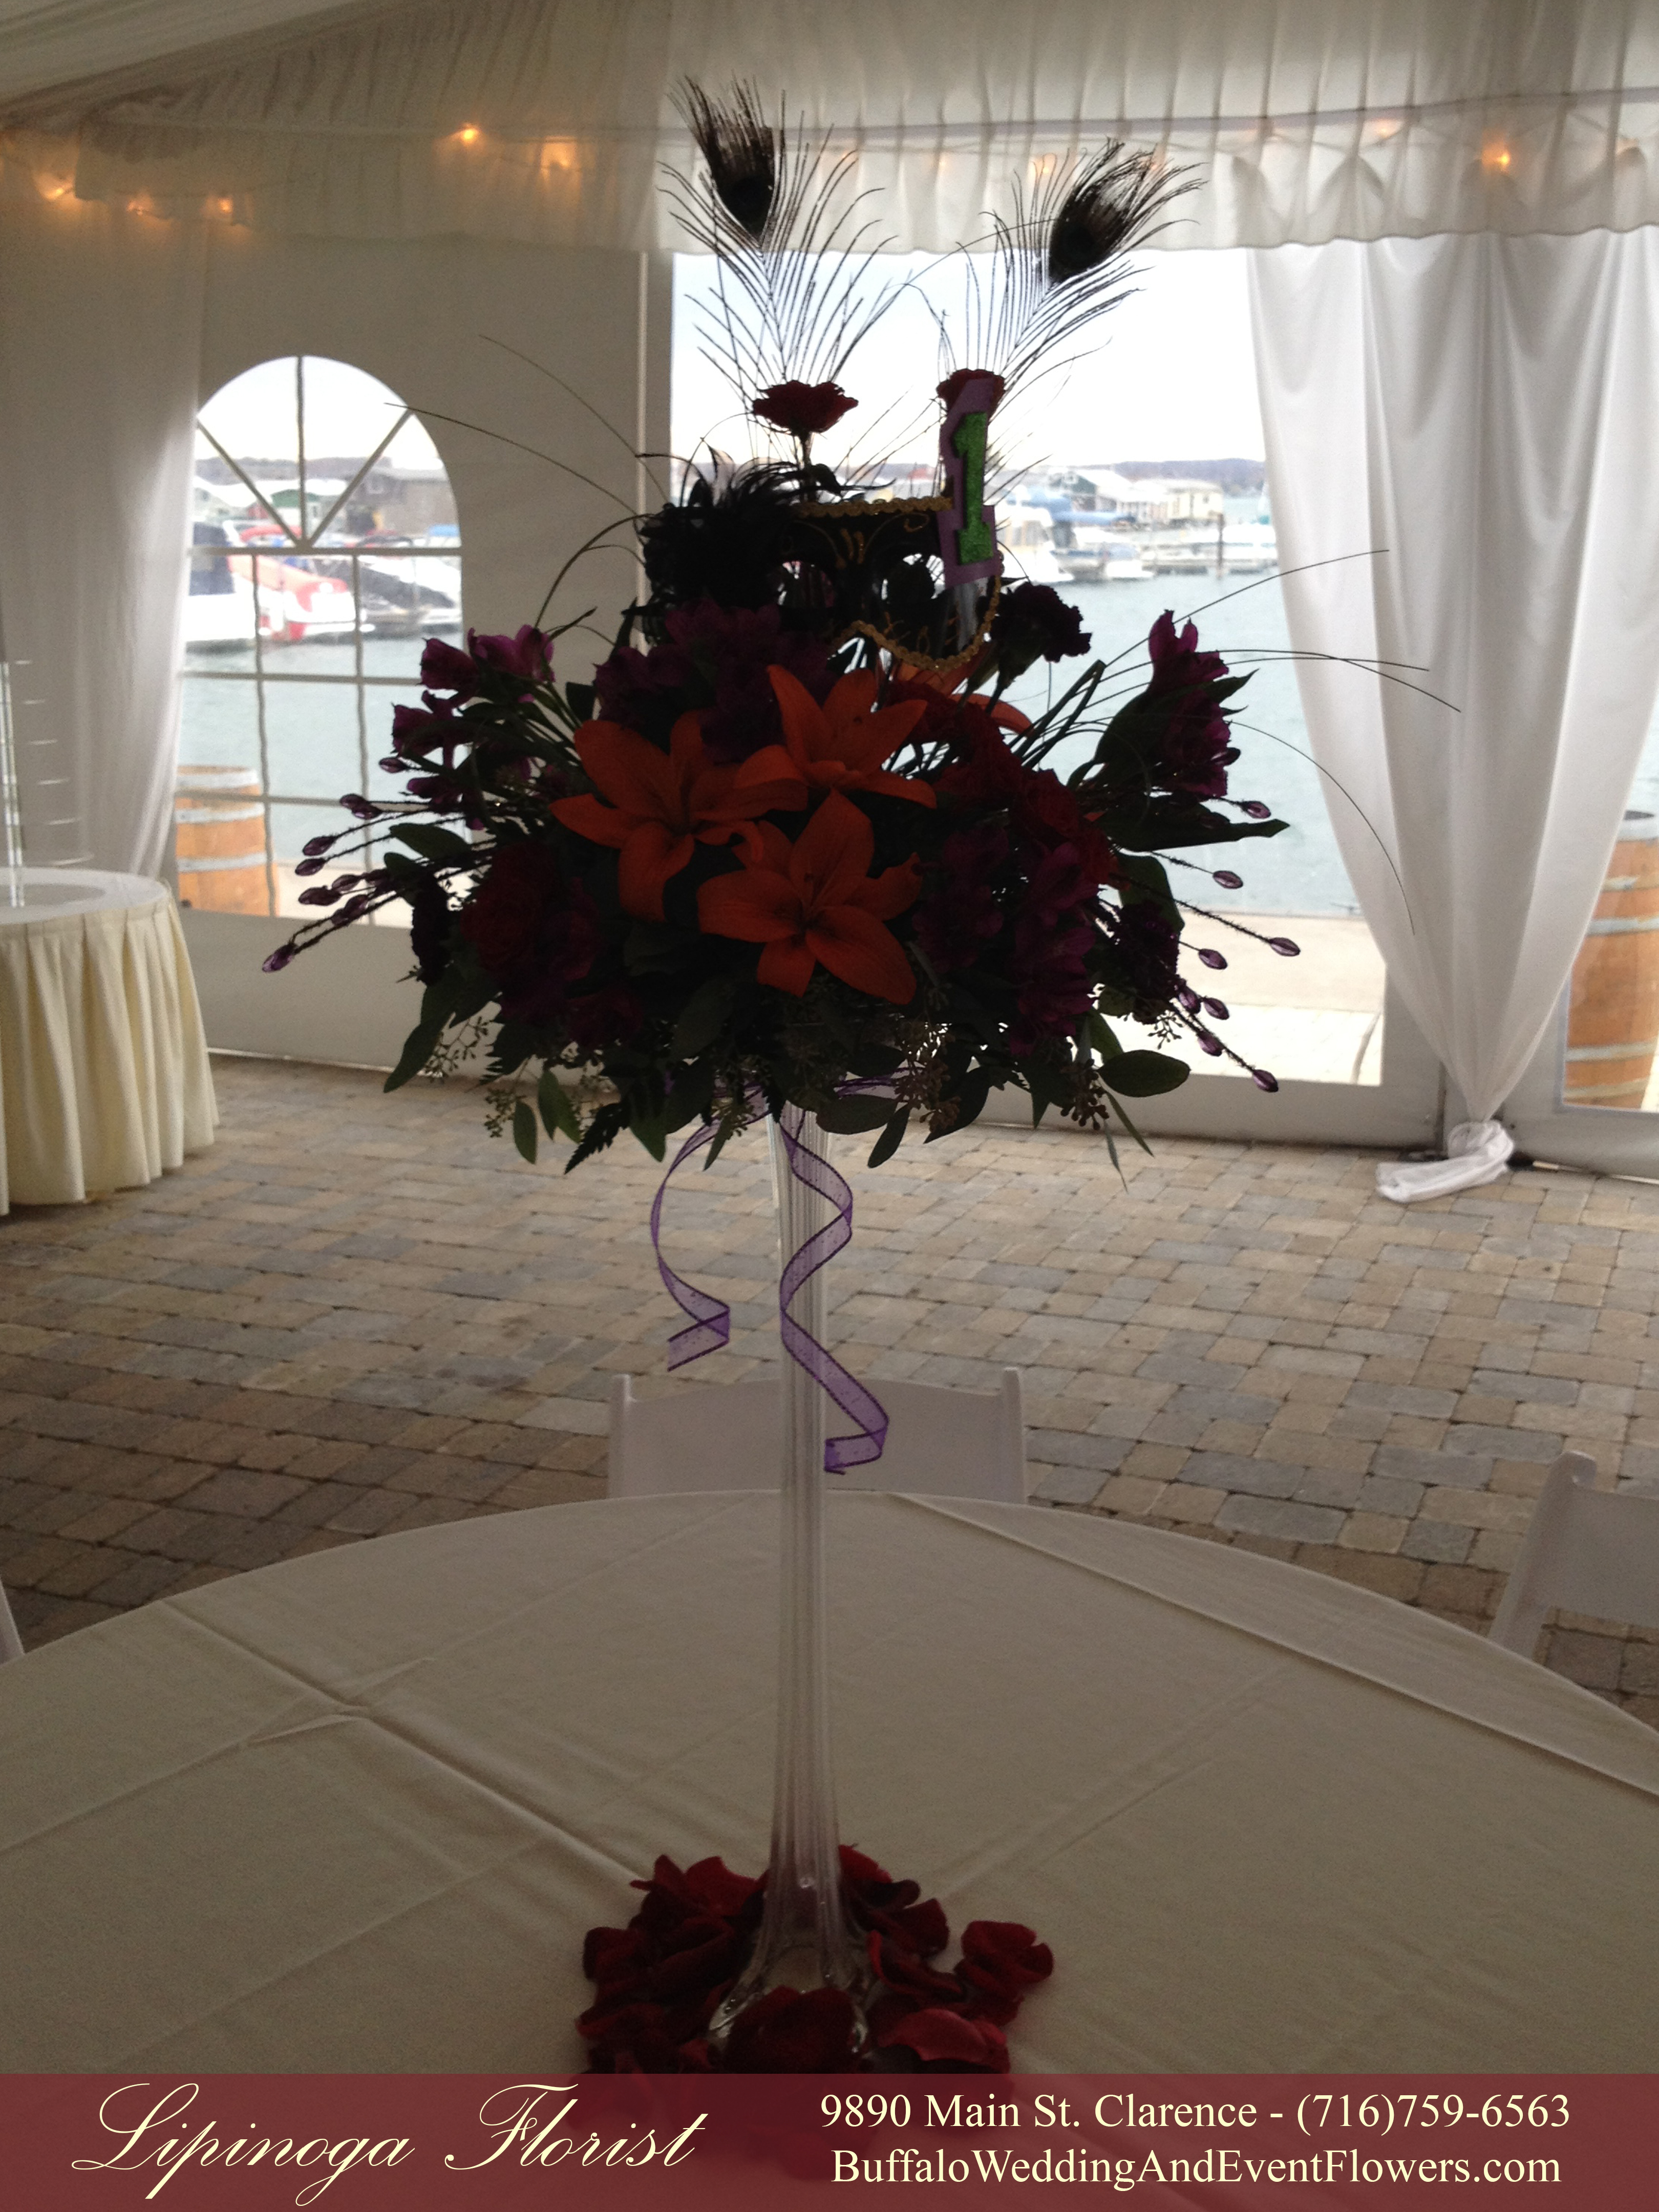 Masquerade Wedding Flowers Buffalo Wedding Amp Event